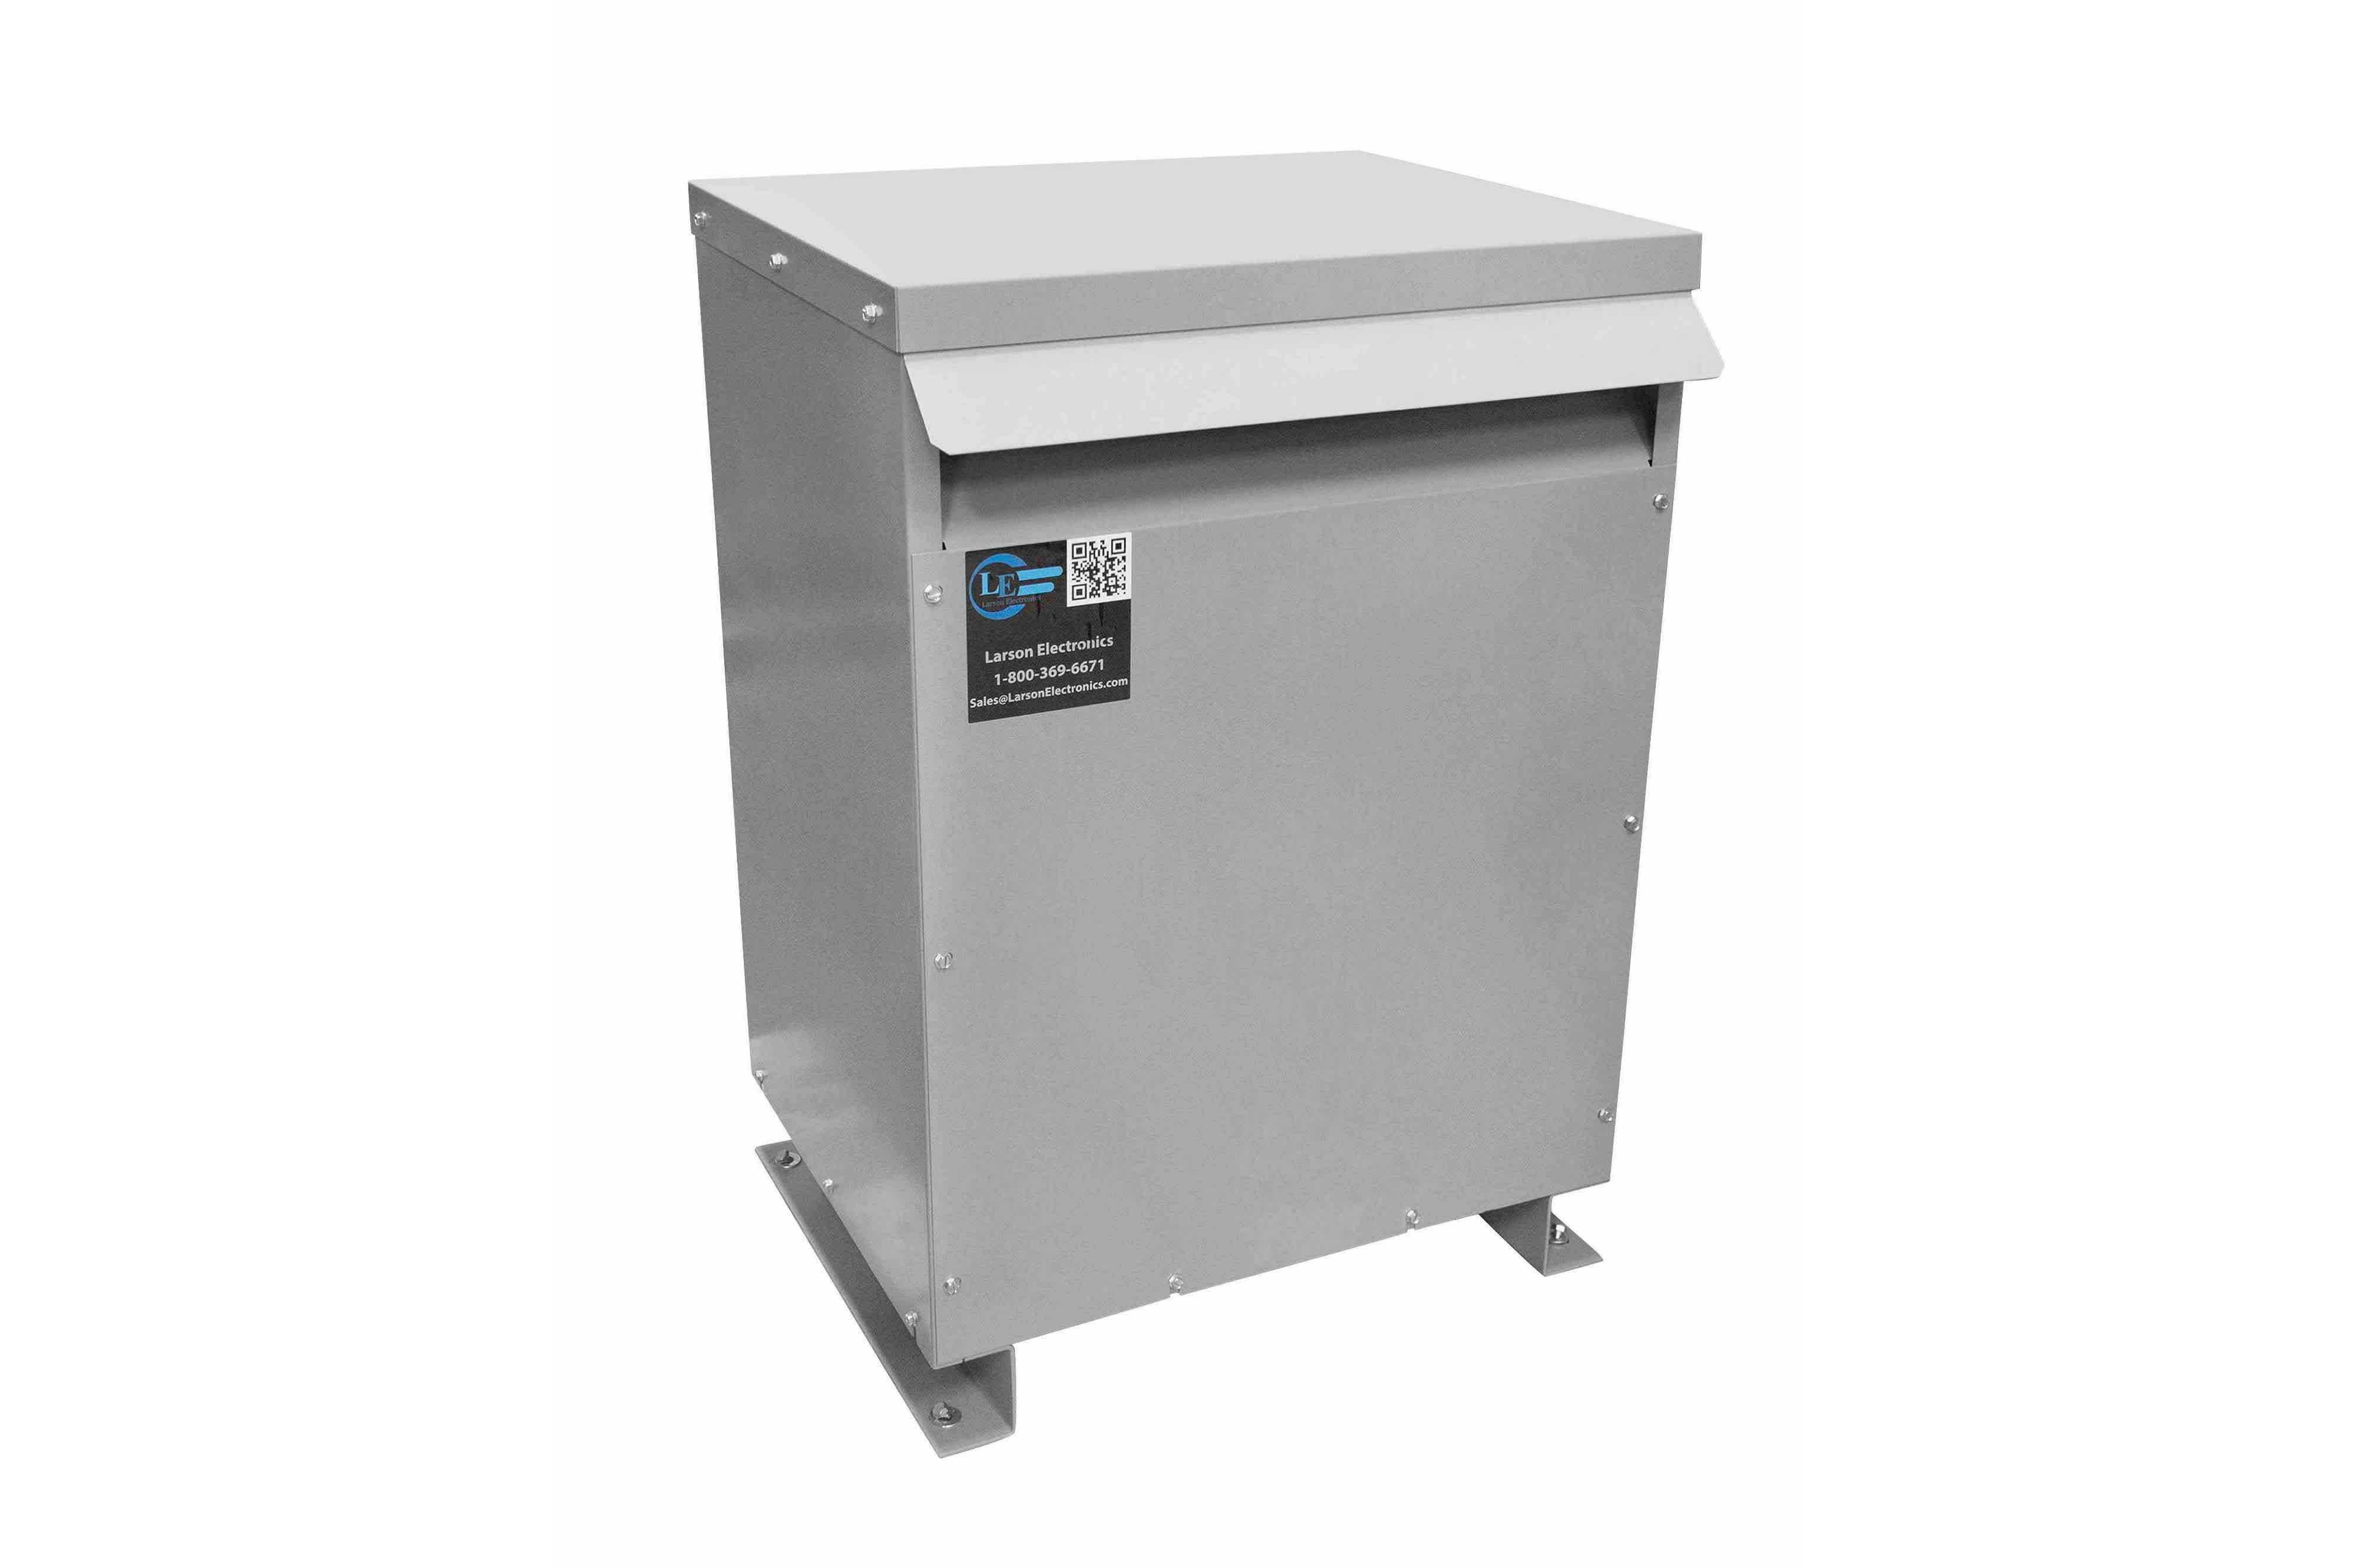 36 kVA 3PH Isolation Transformer, 240V Wye Primary, 480Y/277 Wye-N Secondary, N3R, Ventilated, 60 Hz